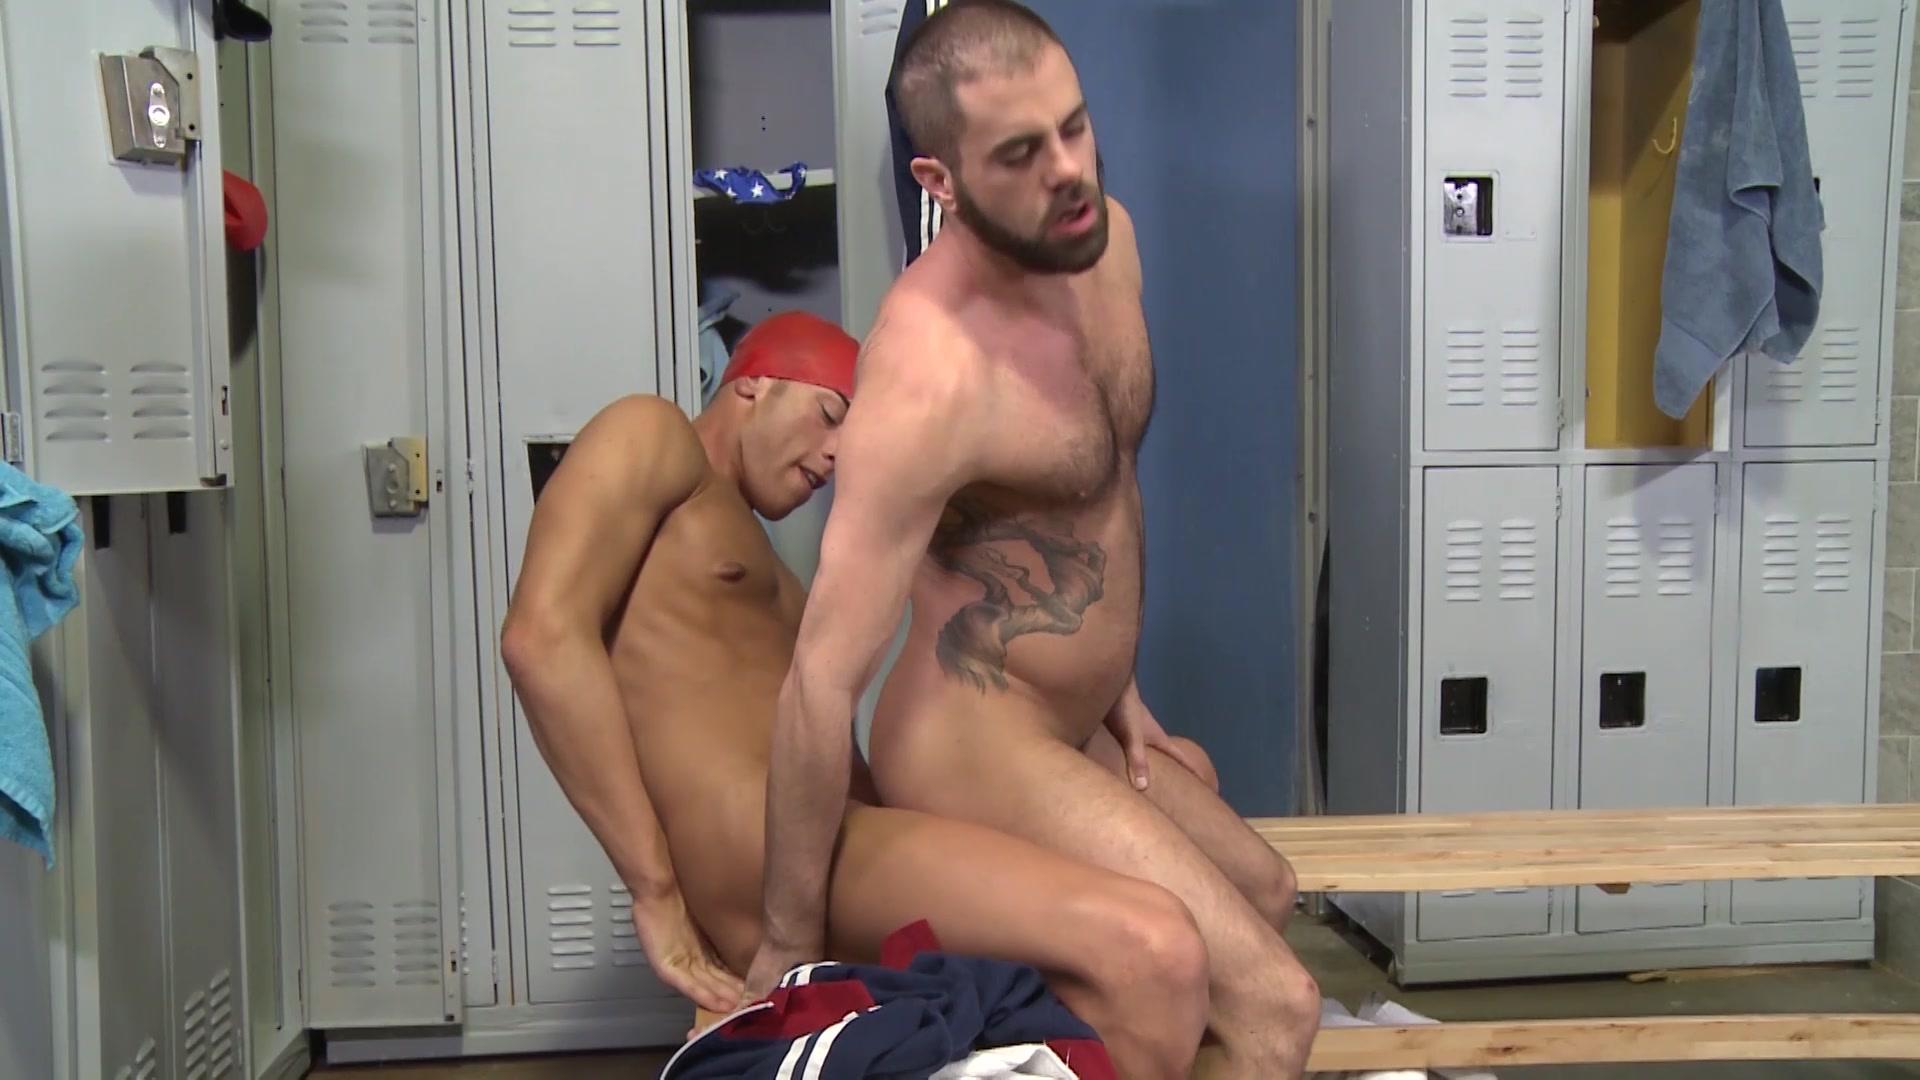 The gay bar